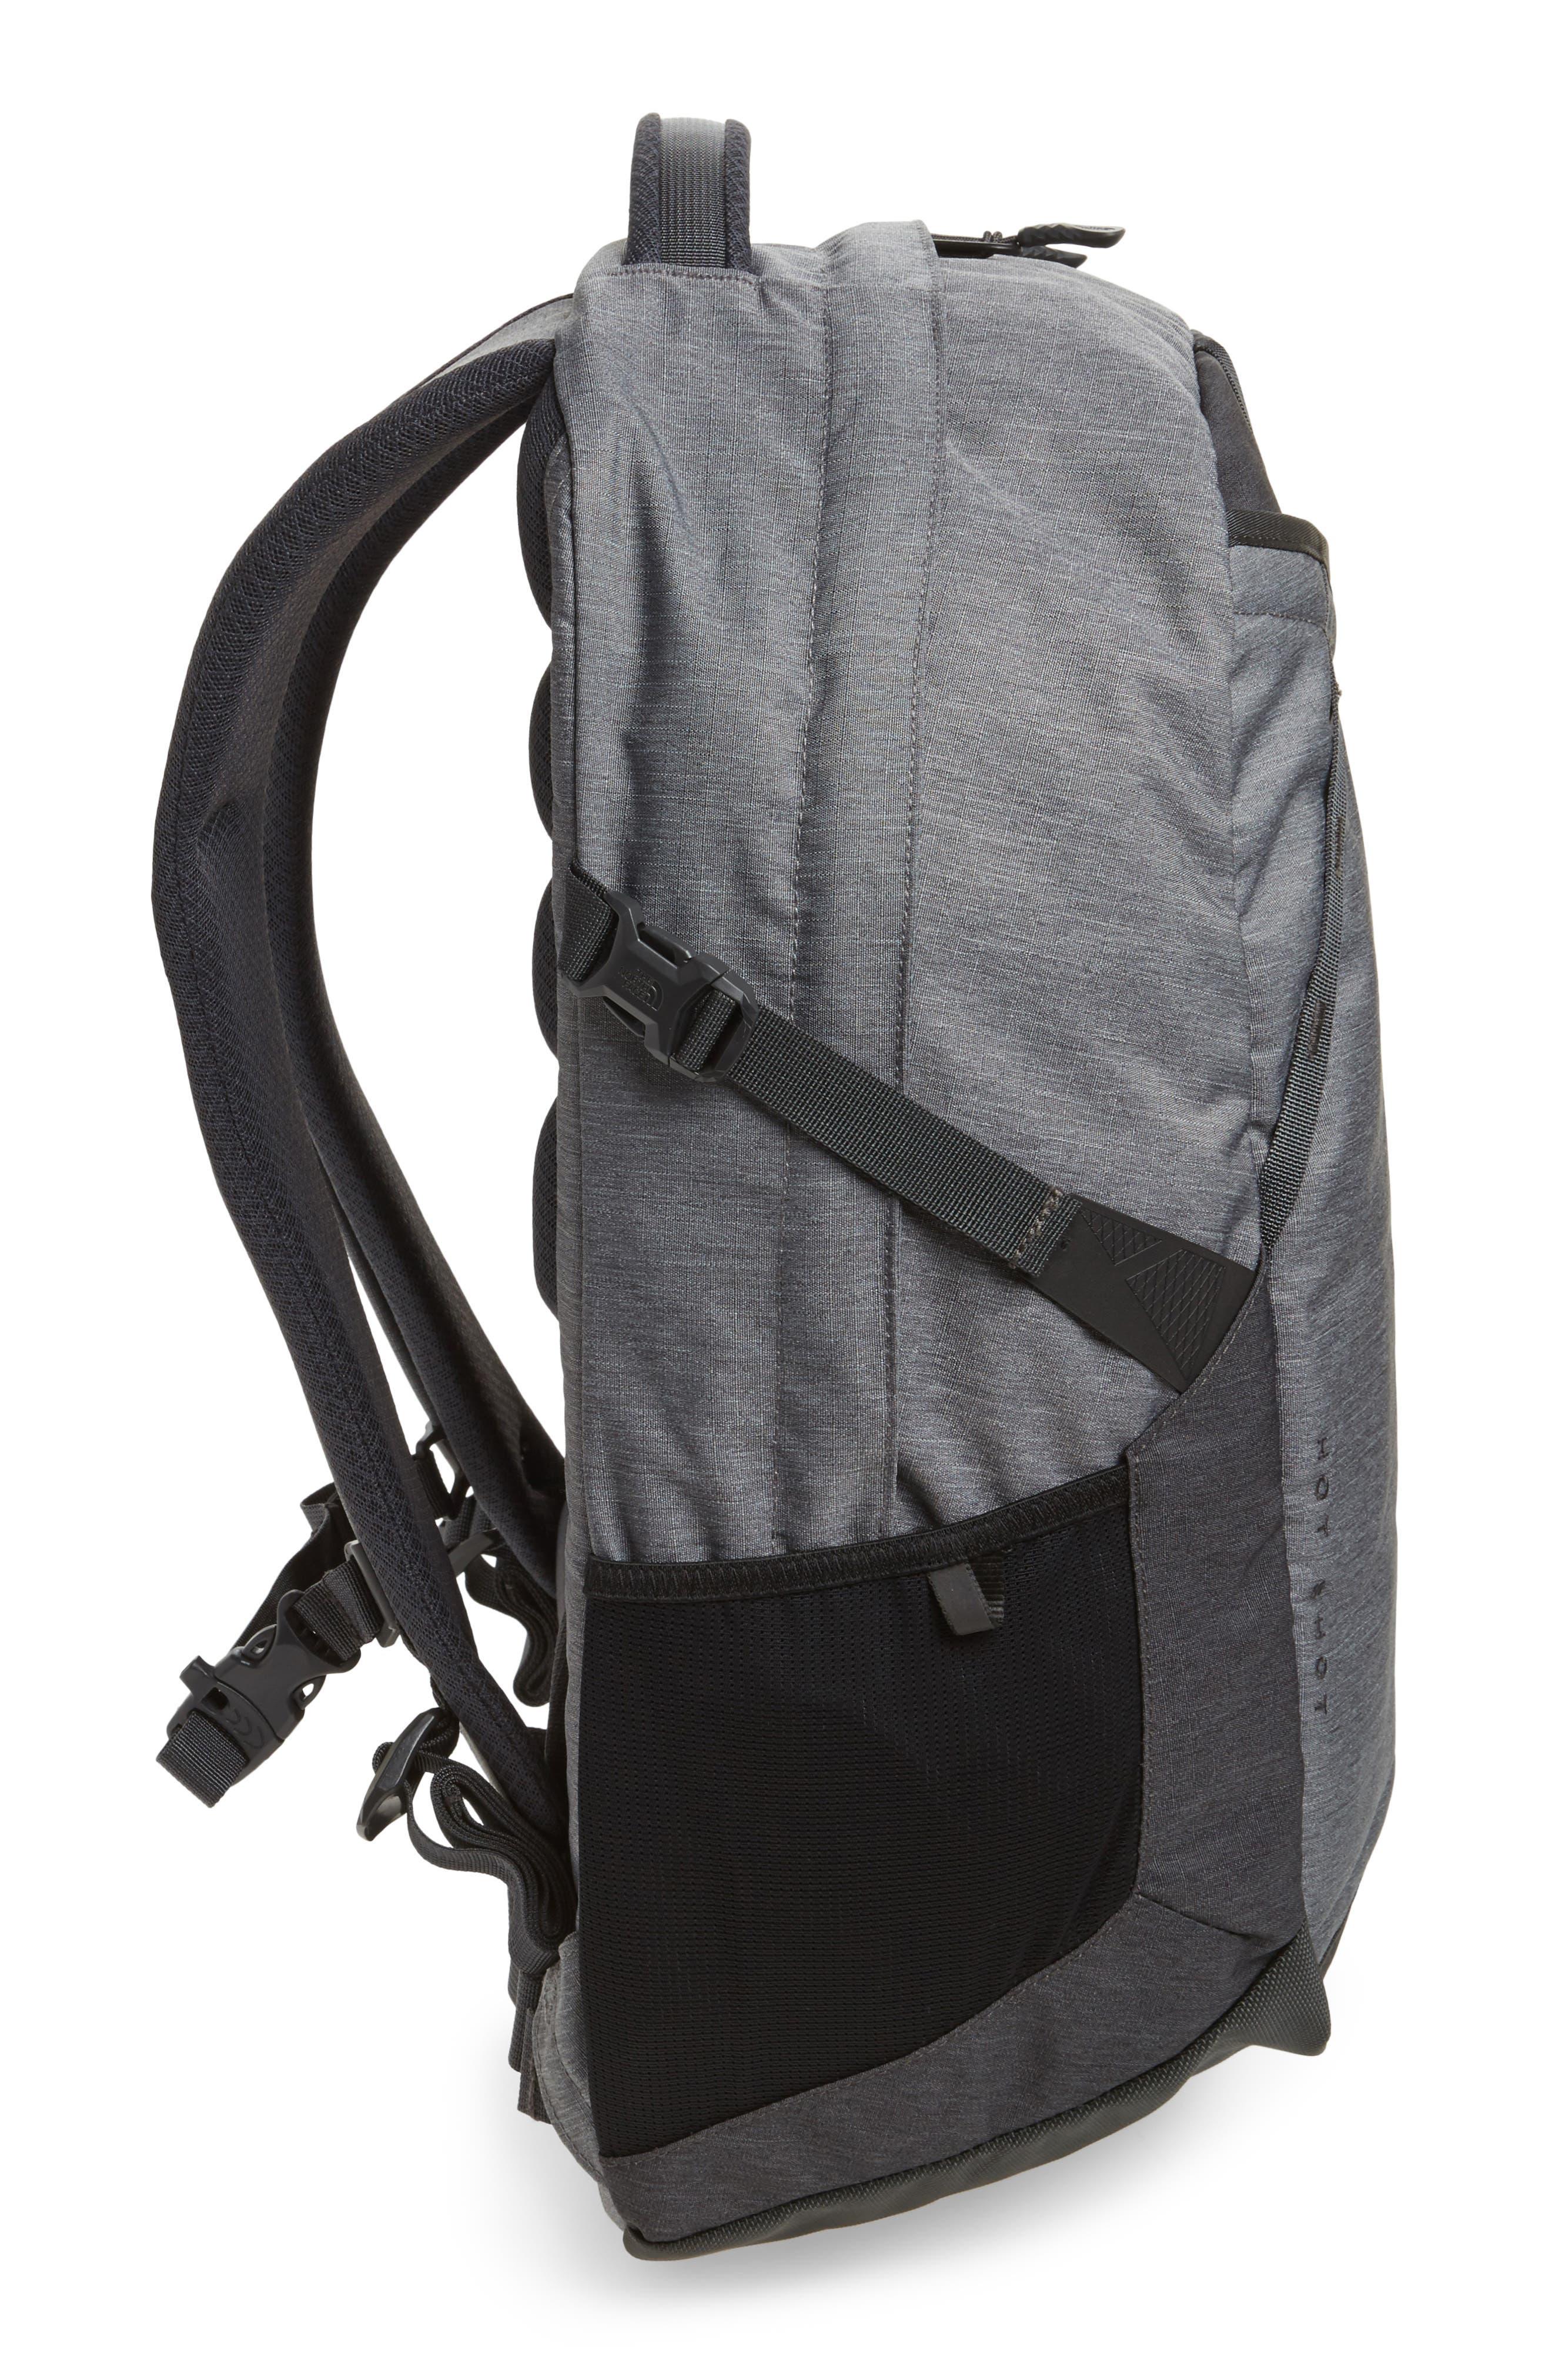 Hot Shot Backpack,                             Alternate thumbnail 5, color,                             021